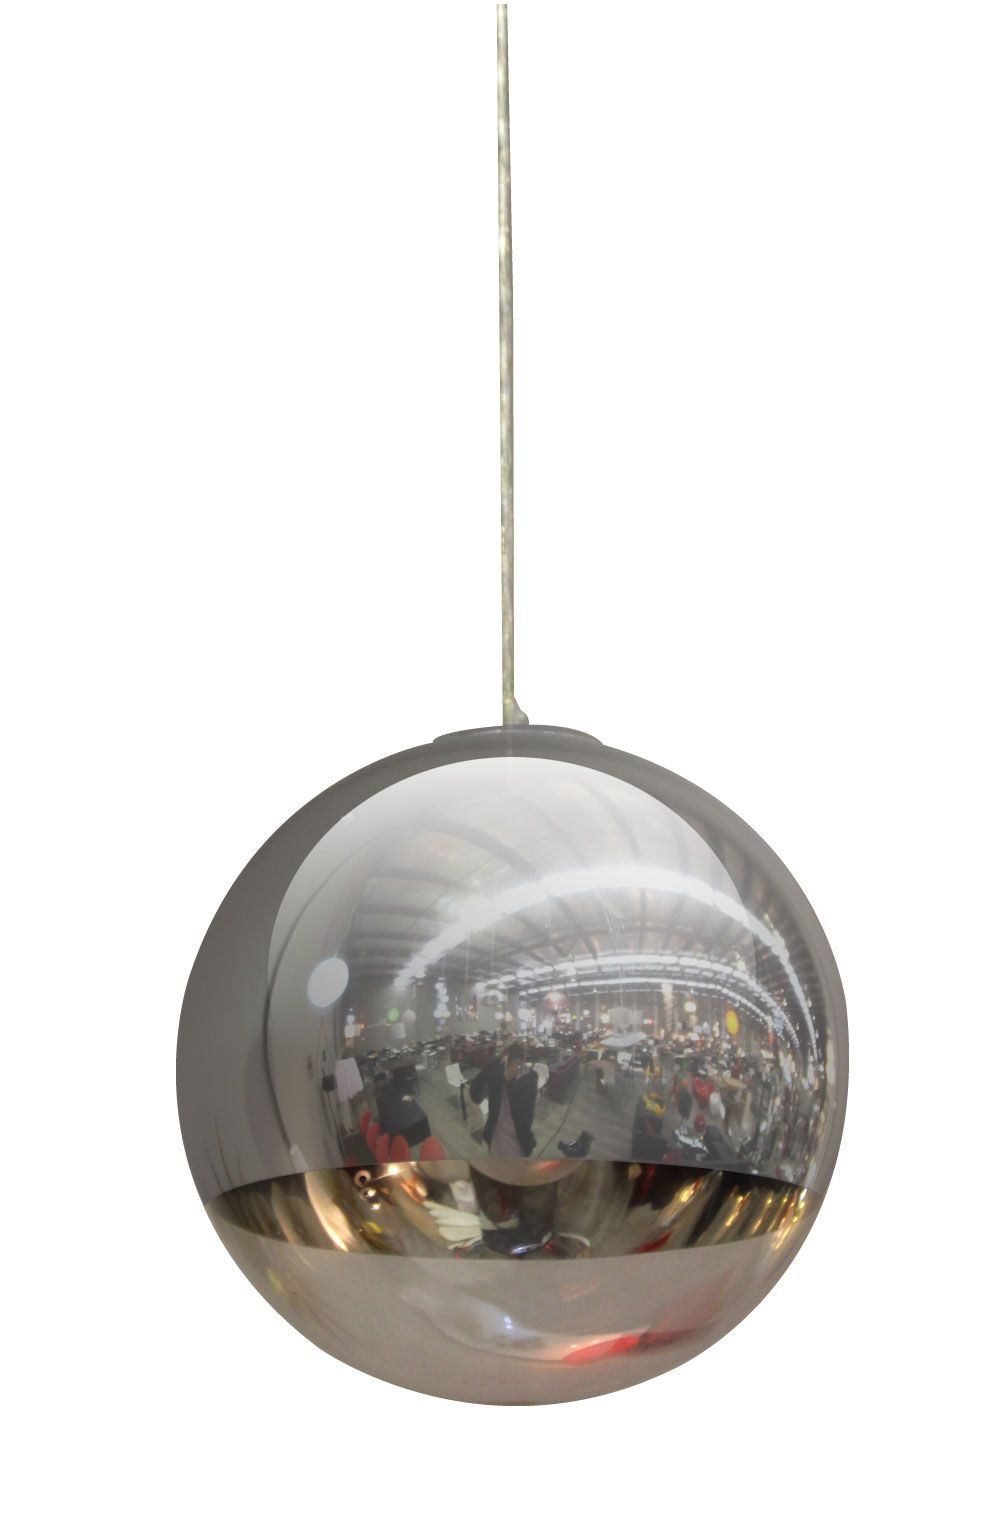 Tom Dixon replica ball pendant